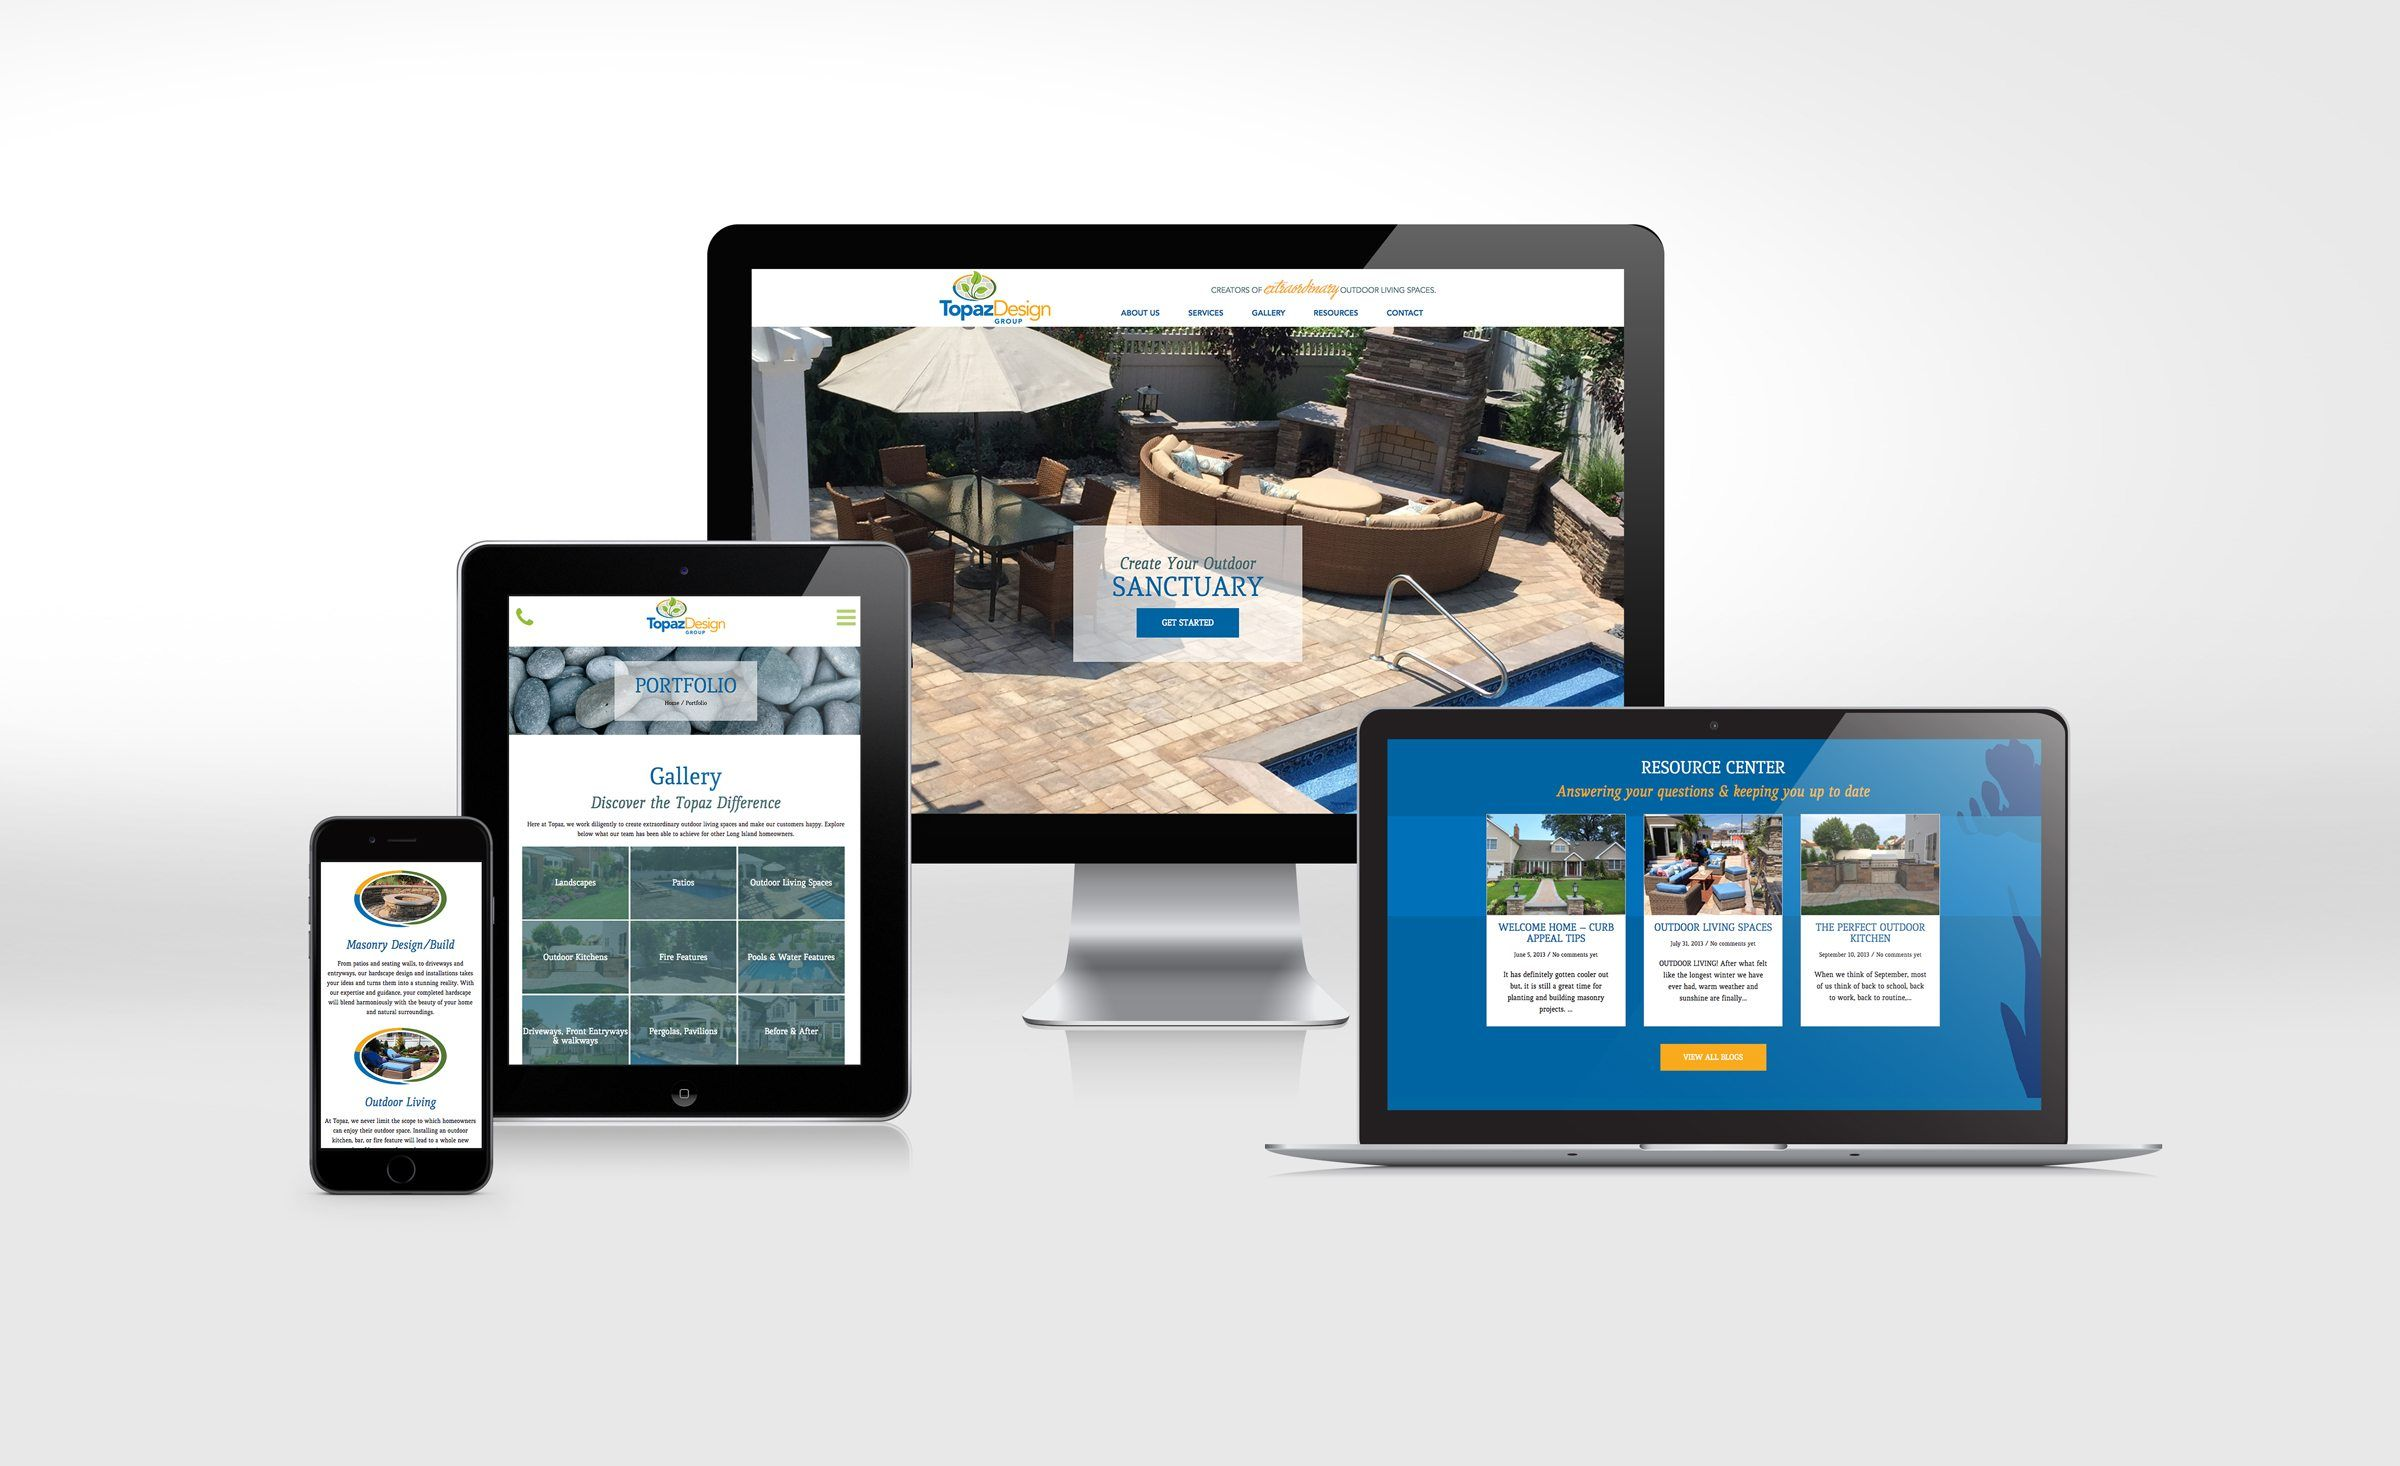 Website Design For Topaz Landscape Design Nj Advertising Agency Nj Ad Agency Nj Web Design Nj Logo Design Web Portfolio Web Design Brand Strategy Design